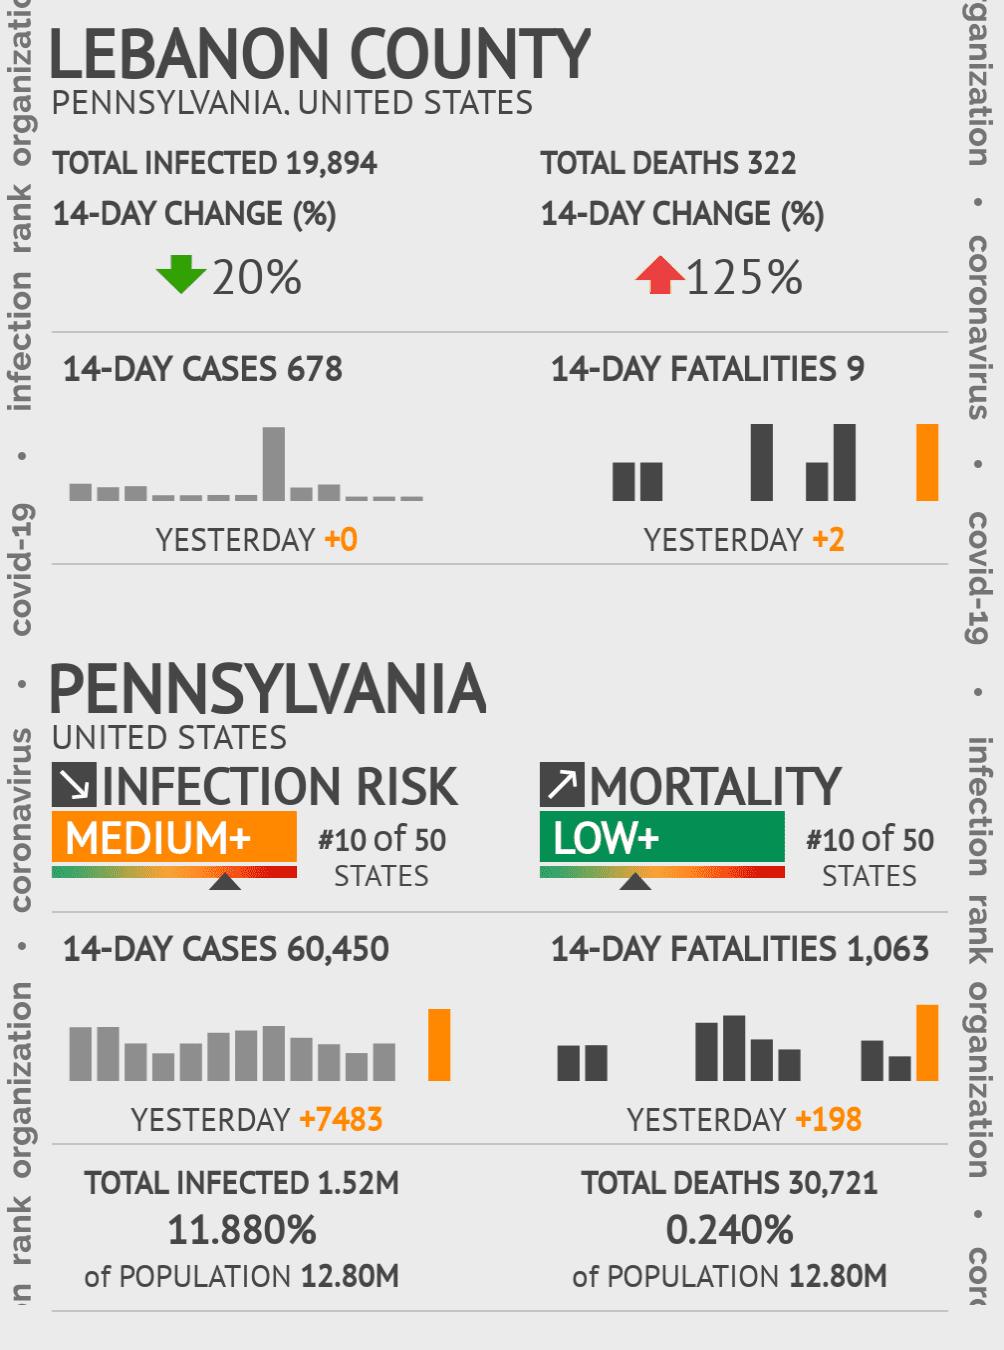 Lebanon County Coronavirus Covid-19 Risk of Infection on February 25, 2021